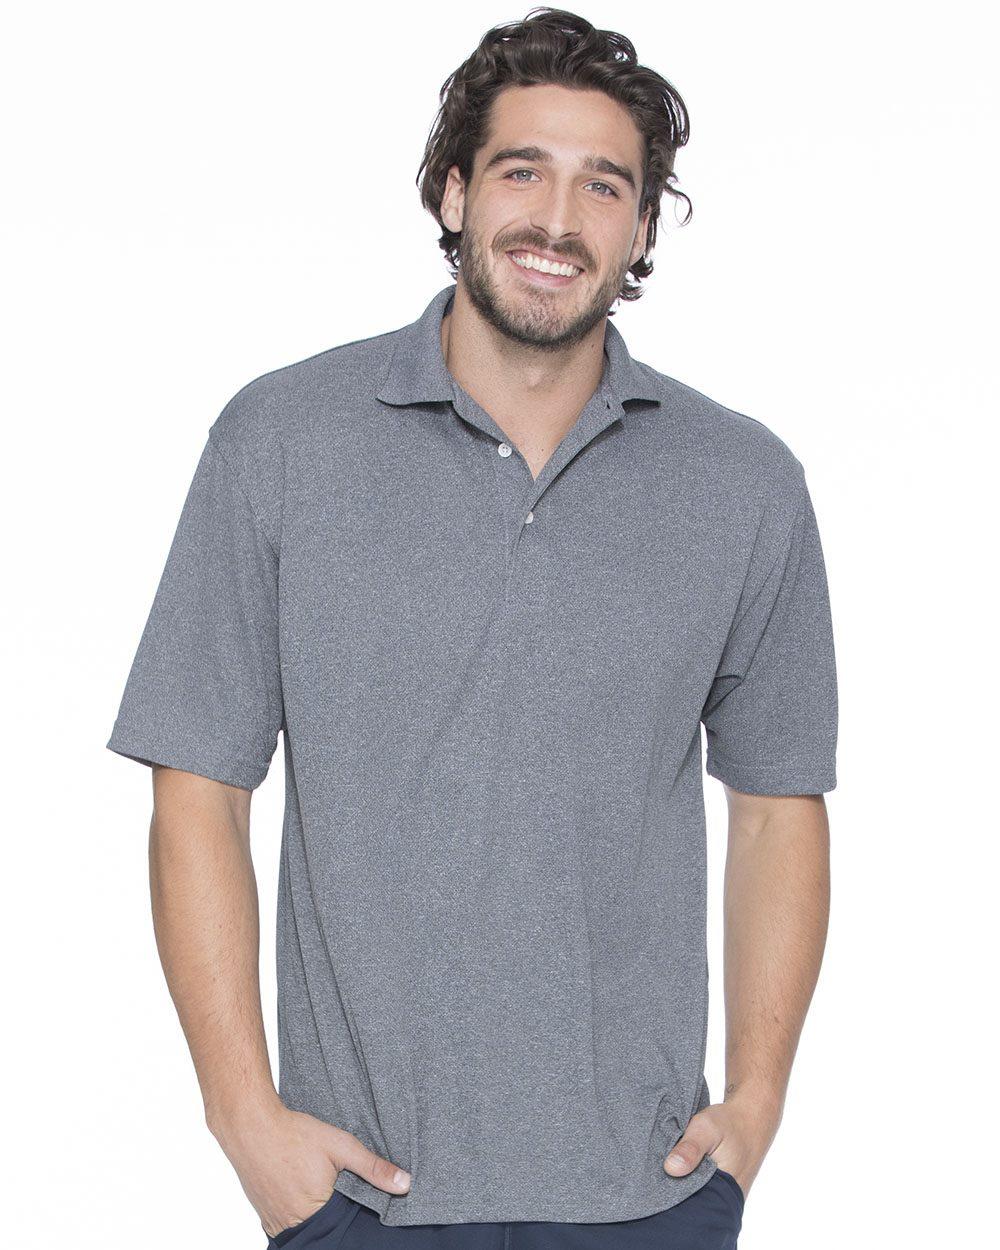 FeatherLite 0469 Moisture Free PiqueSport Shirt